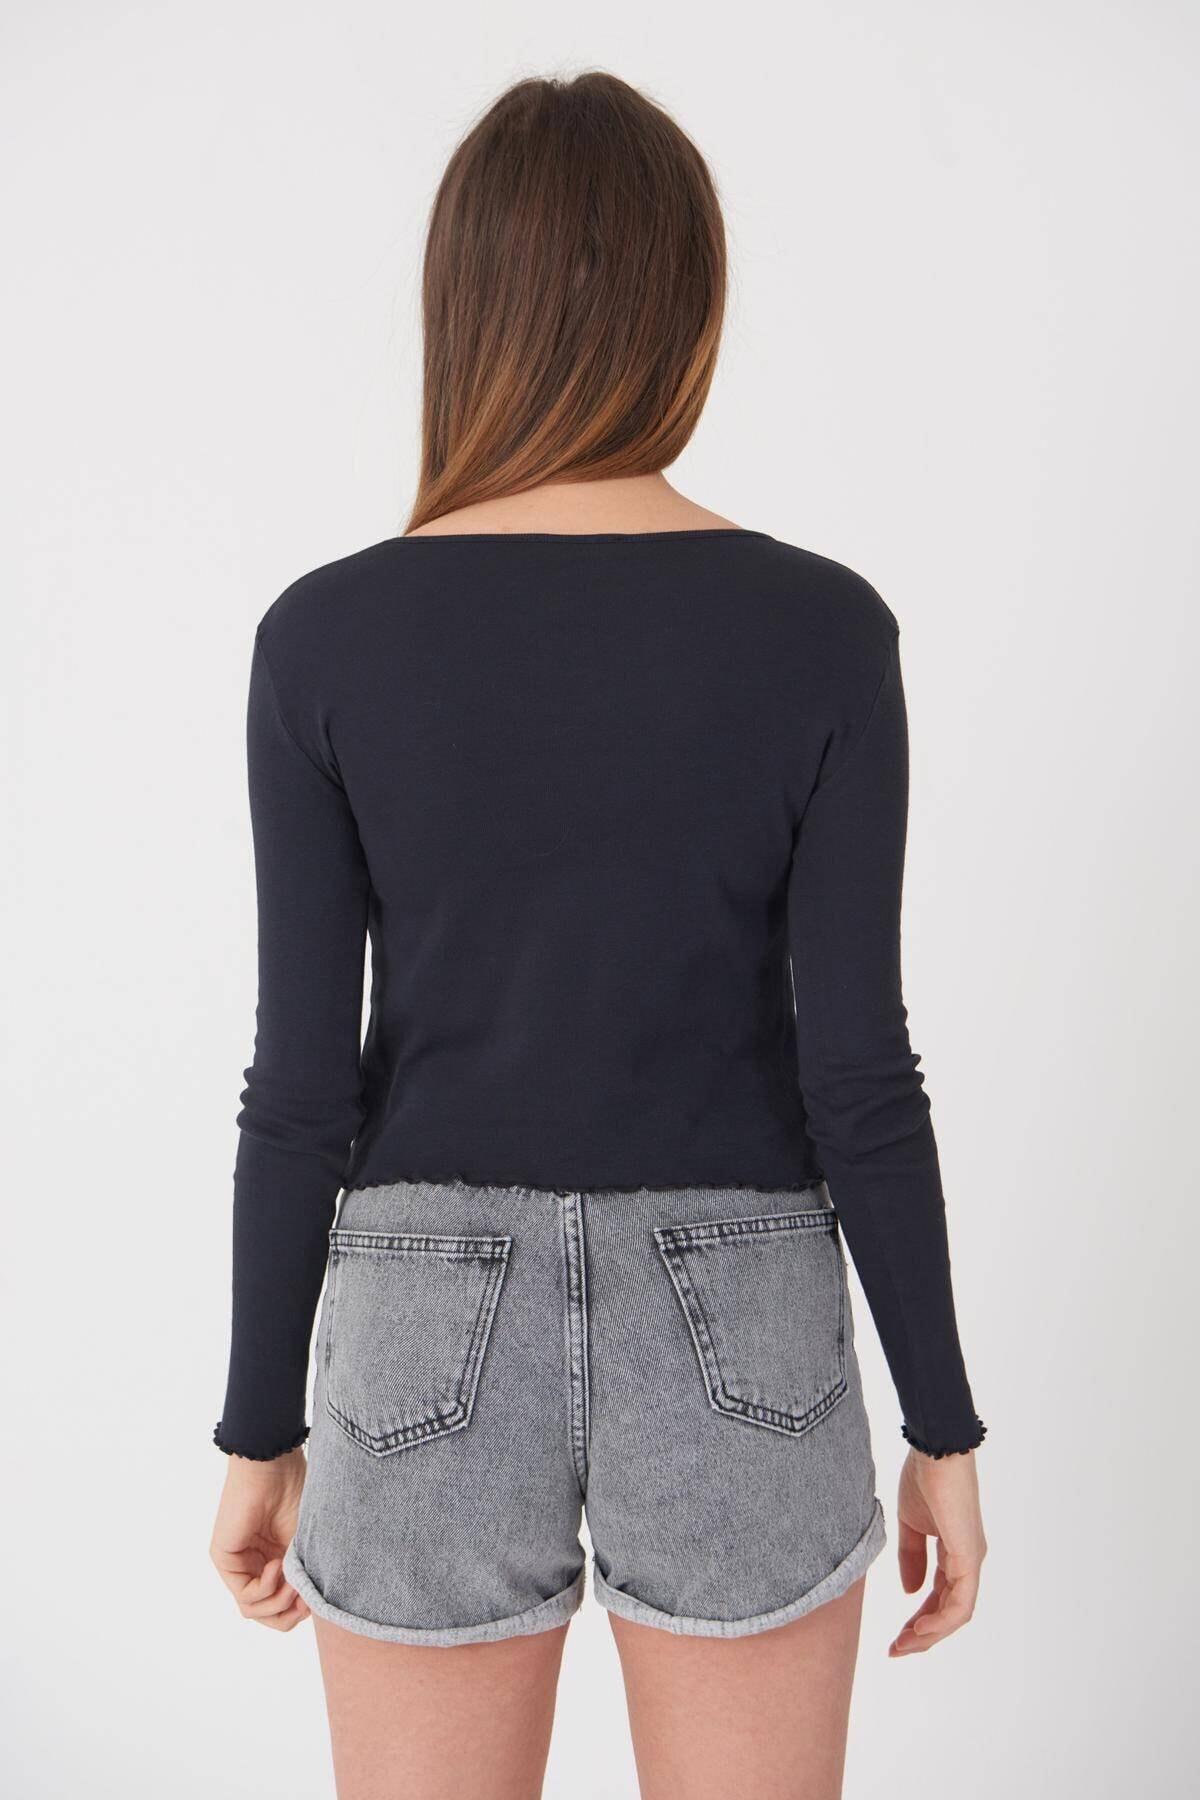 Addax Kadın Antrasit V Yaka Bluz P1085 - E11 Adx-0000023312 4